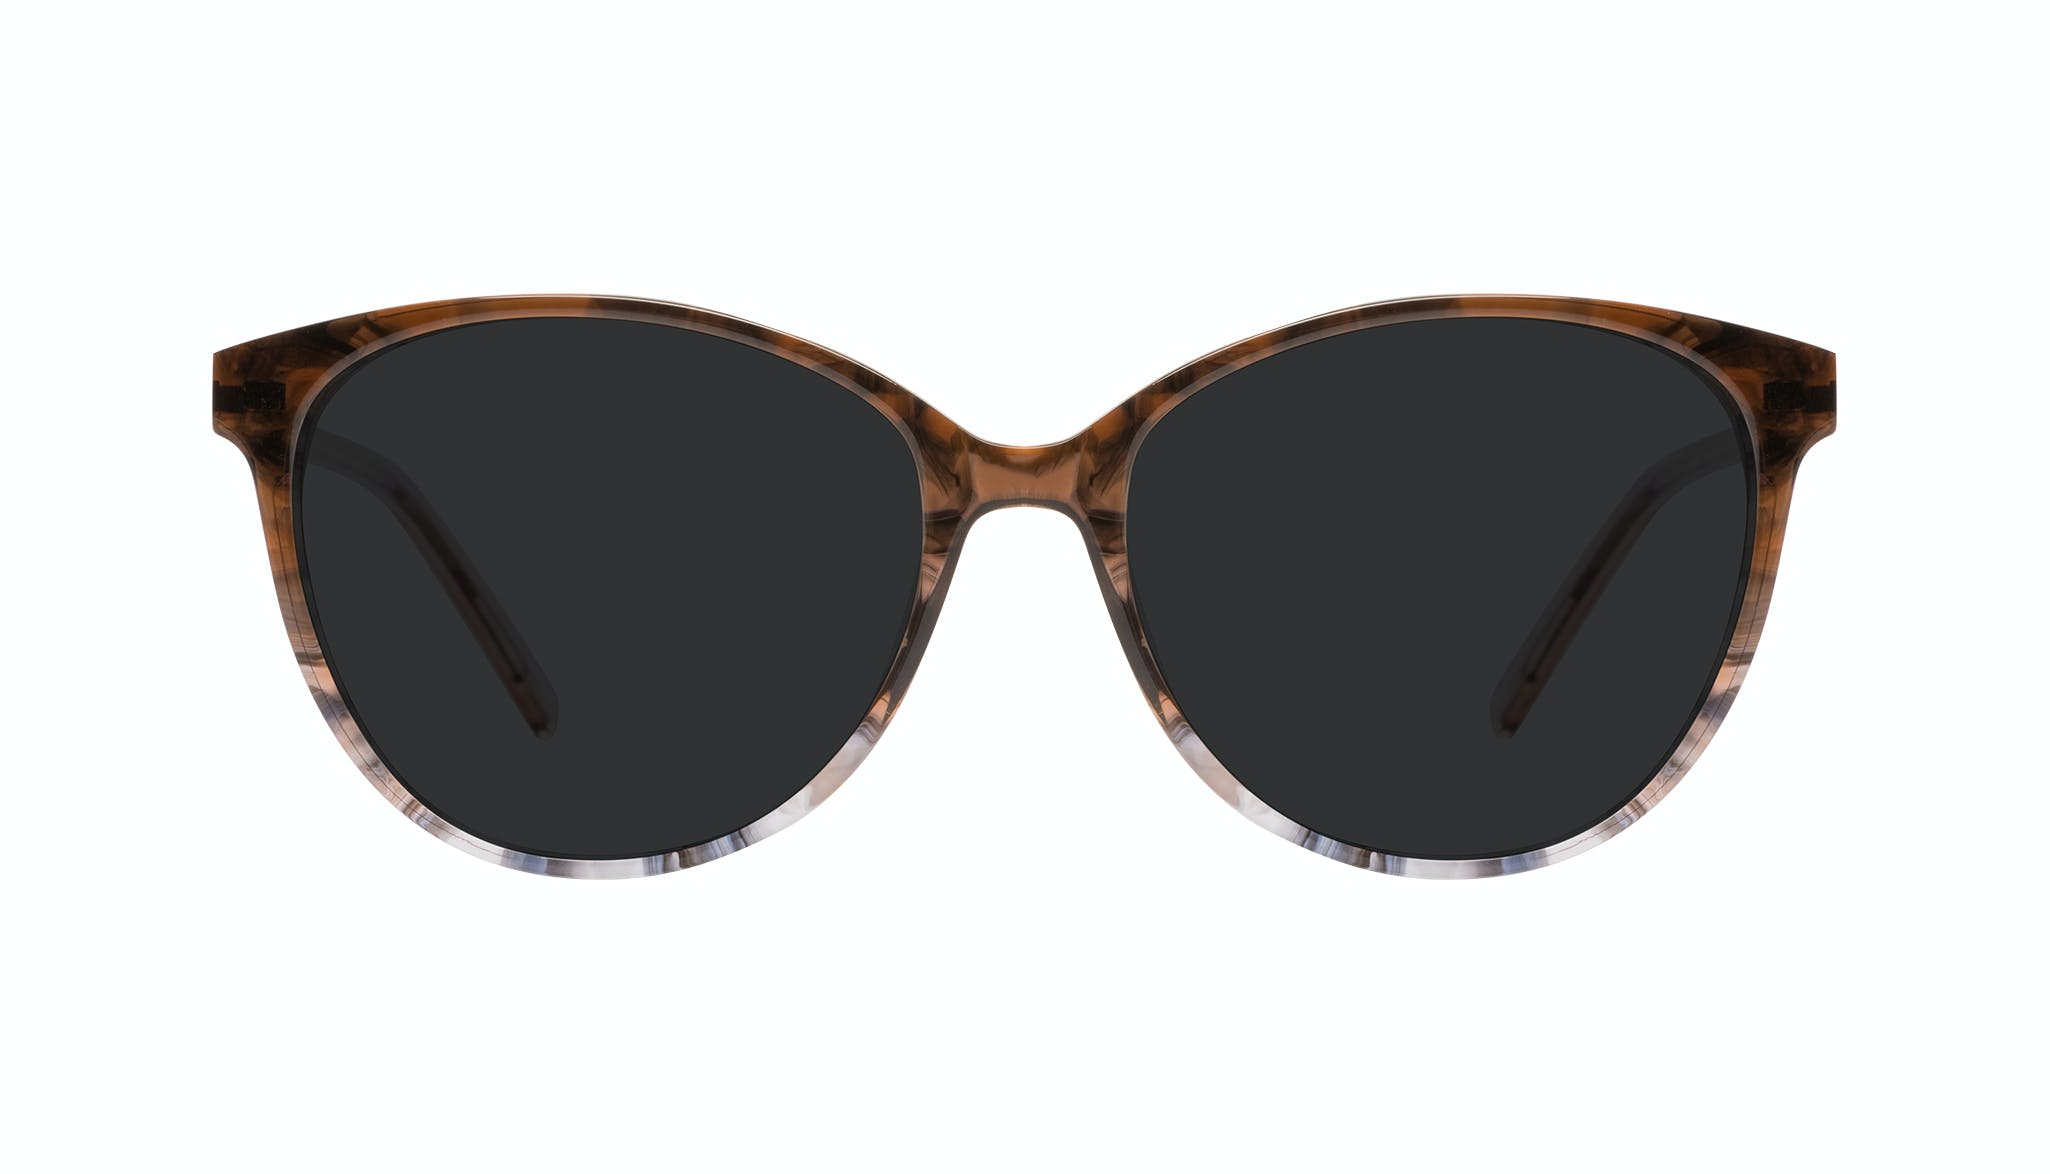 Affordable Fashion Glasses Round Sunglasses Women Imagine II Plus Moondust Front